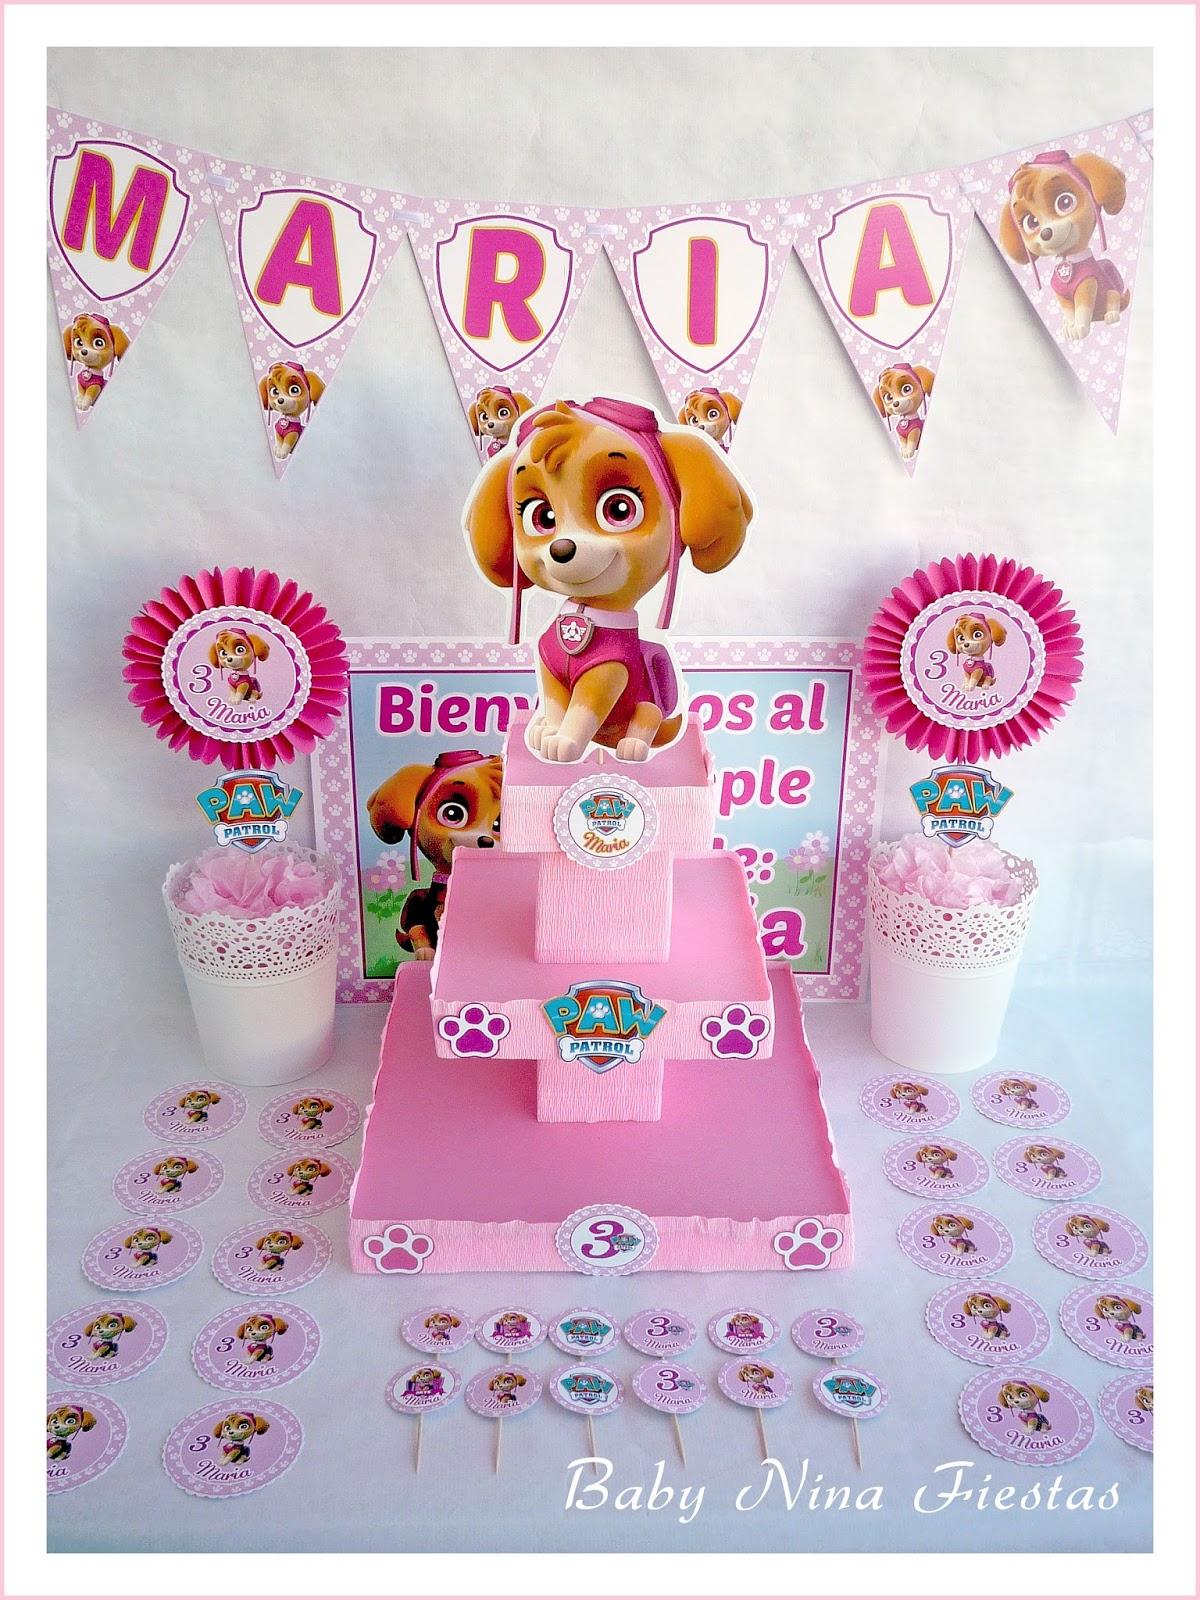 Baby nina fiestas kit de cumplea os skye patrulla canina - Cumpleanos patrulla canina ...